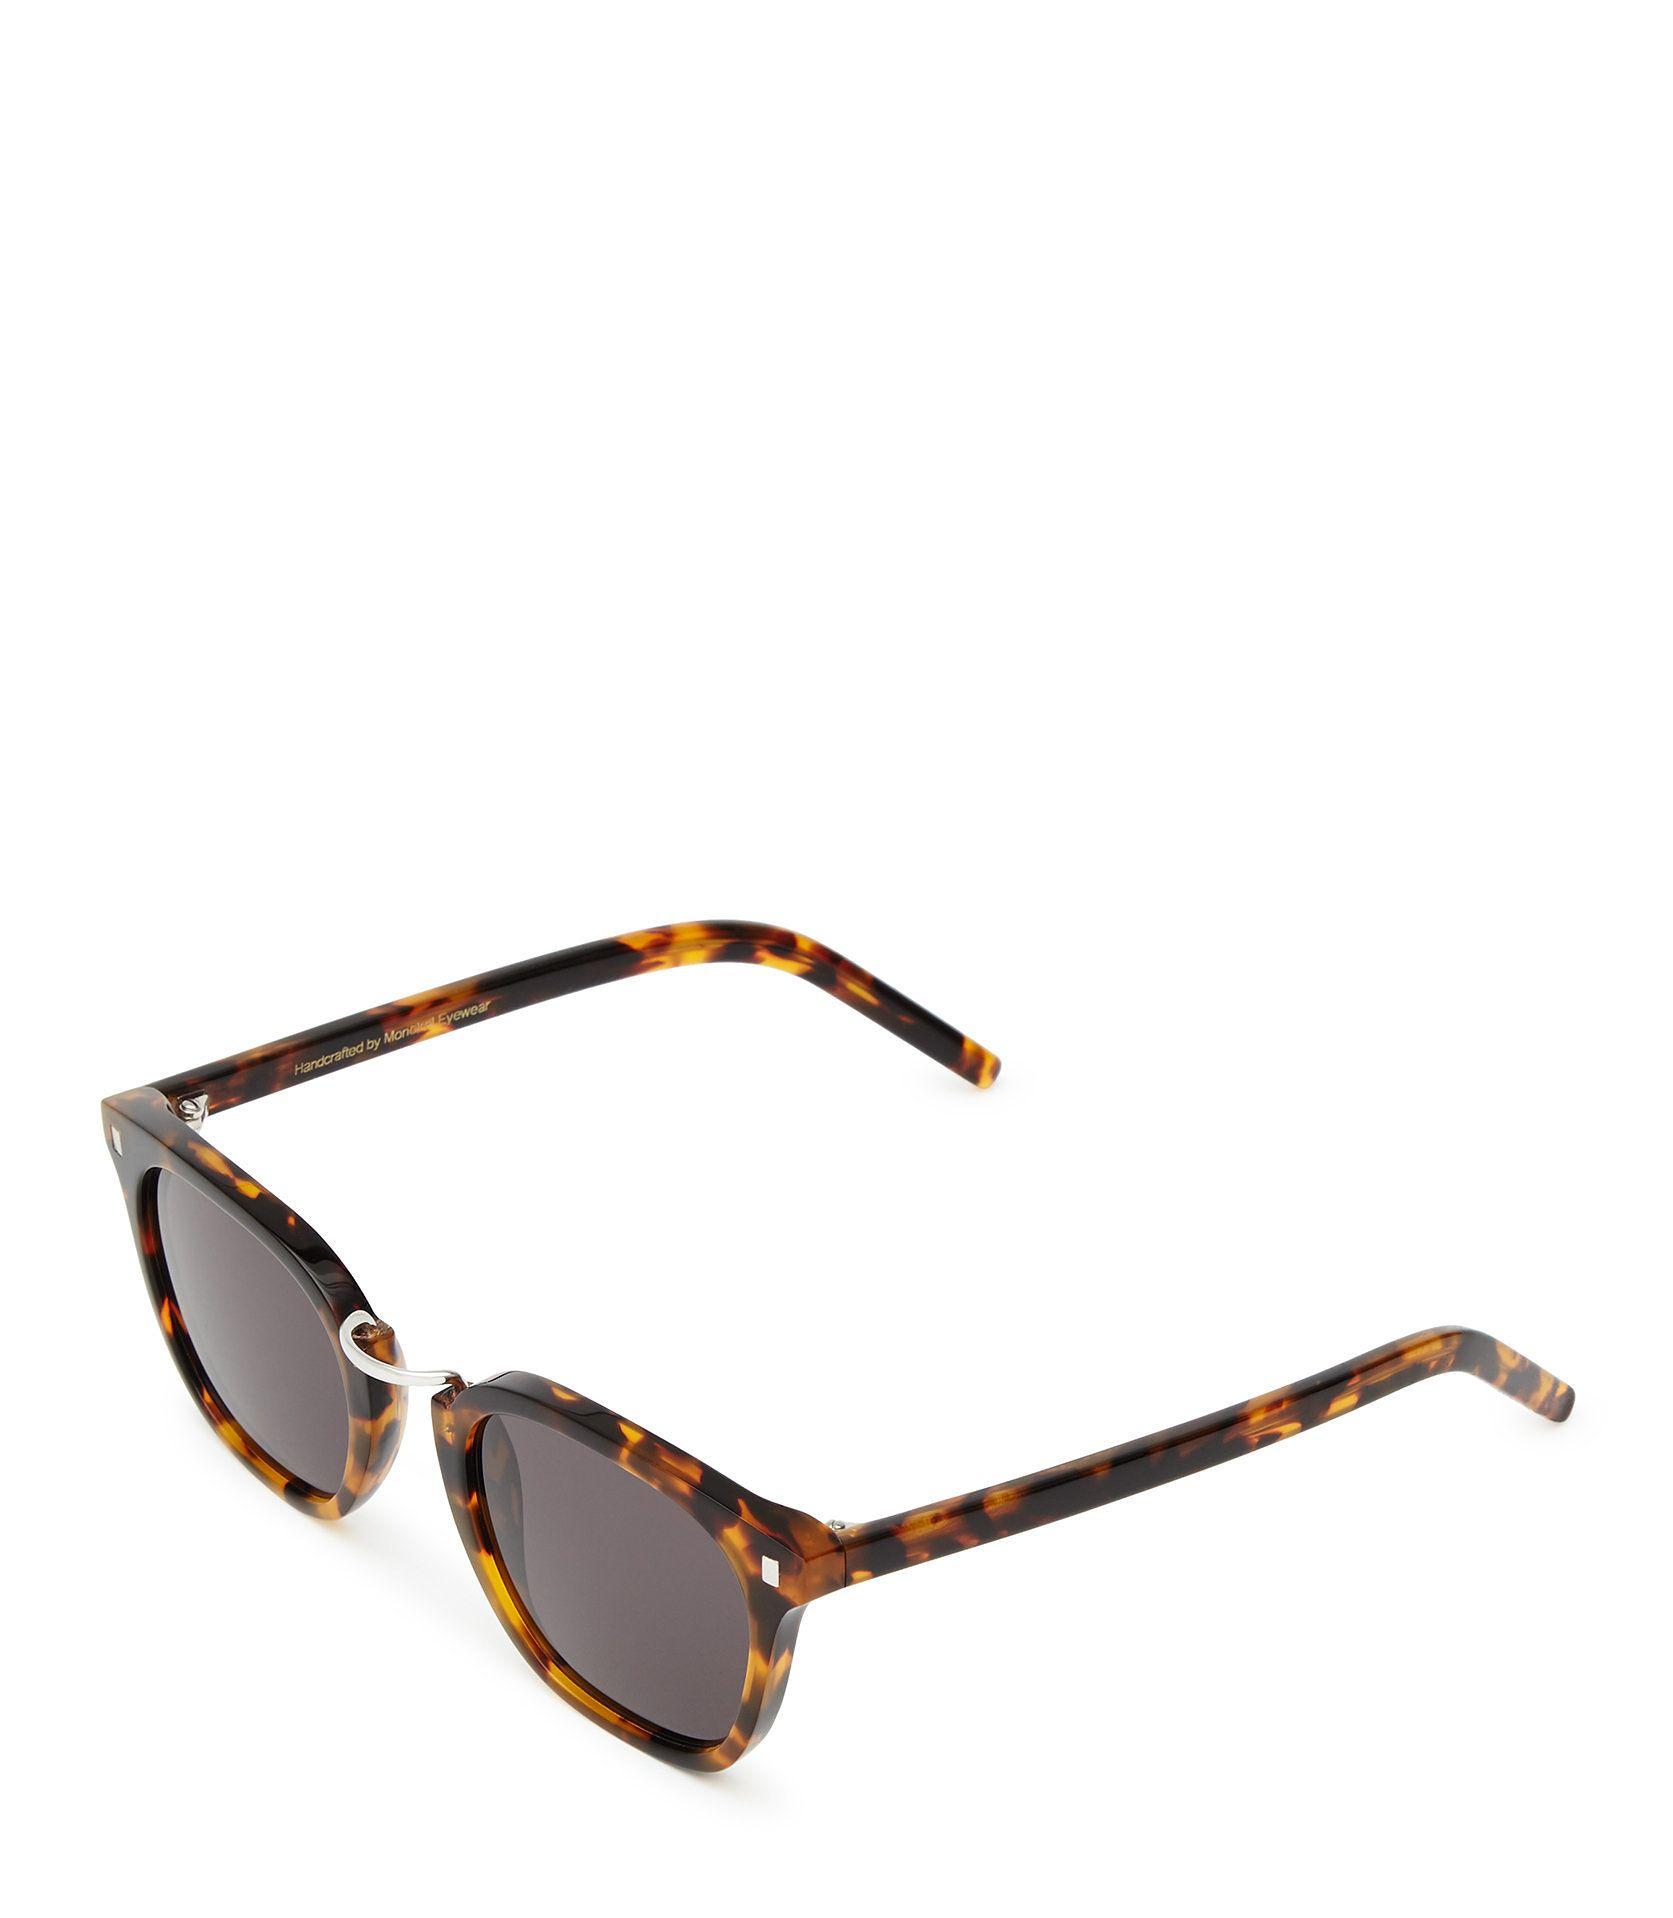 c3fa4b6bbc Ando Tortoiseshell Monokel Eyewear Bridge Sunglasses - REISS ...